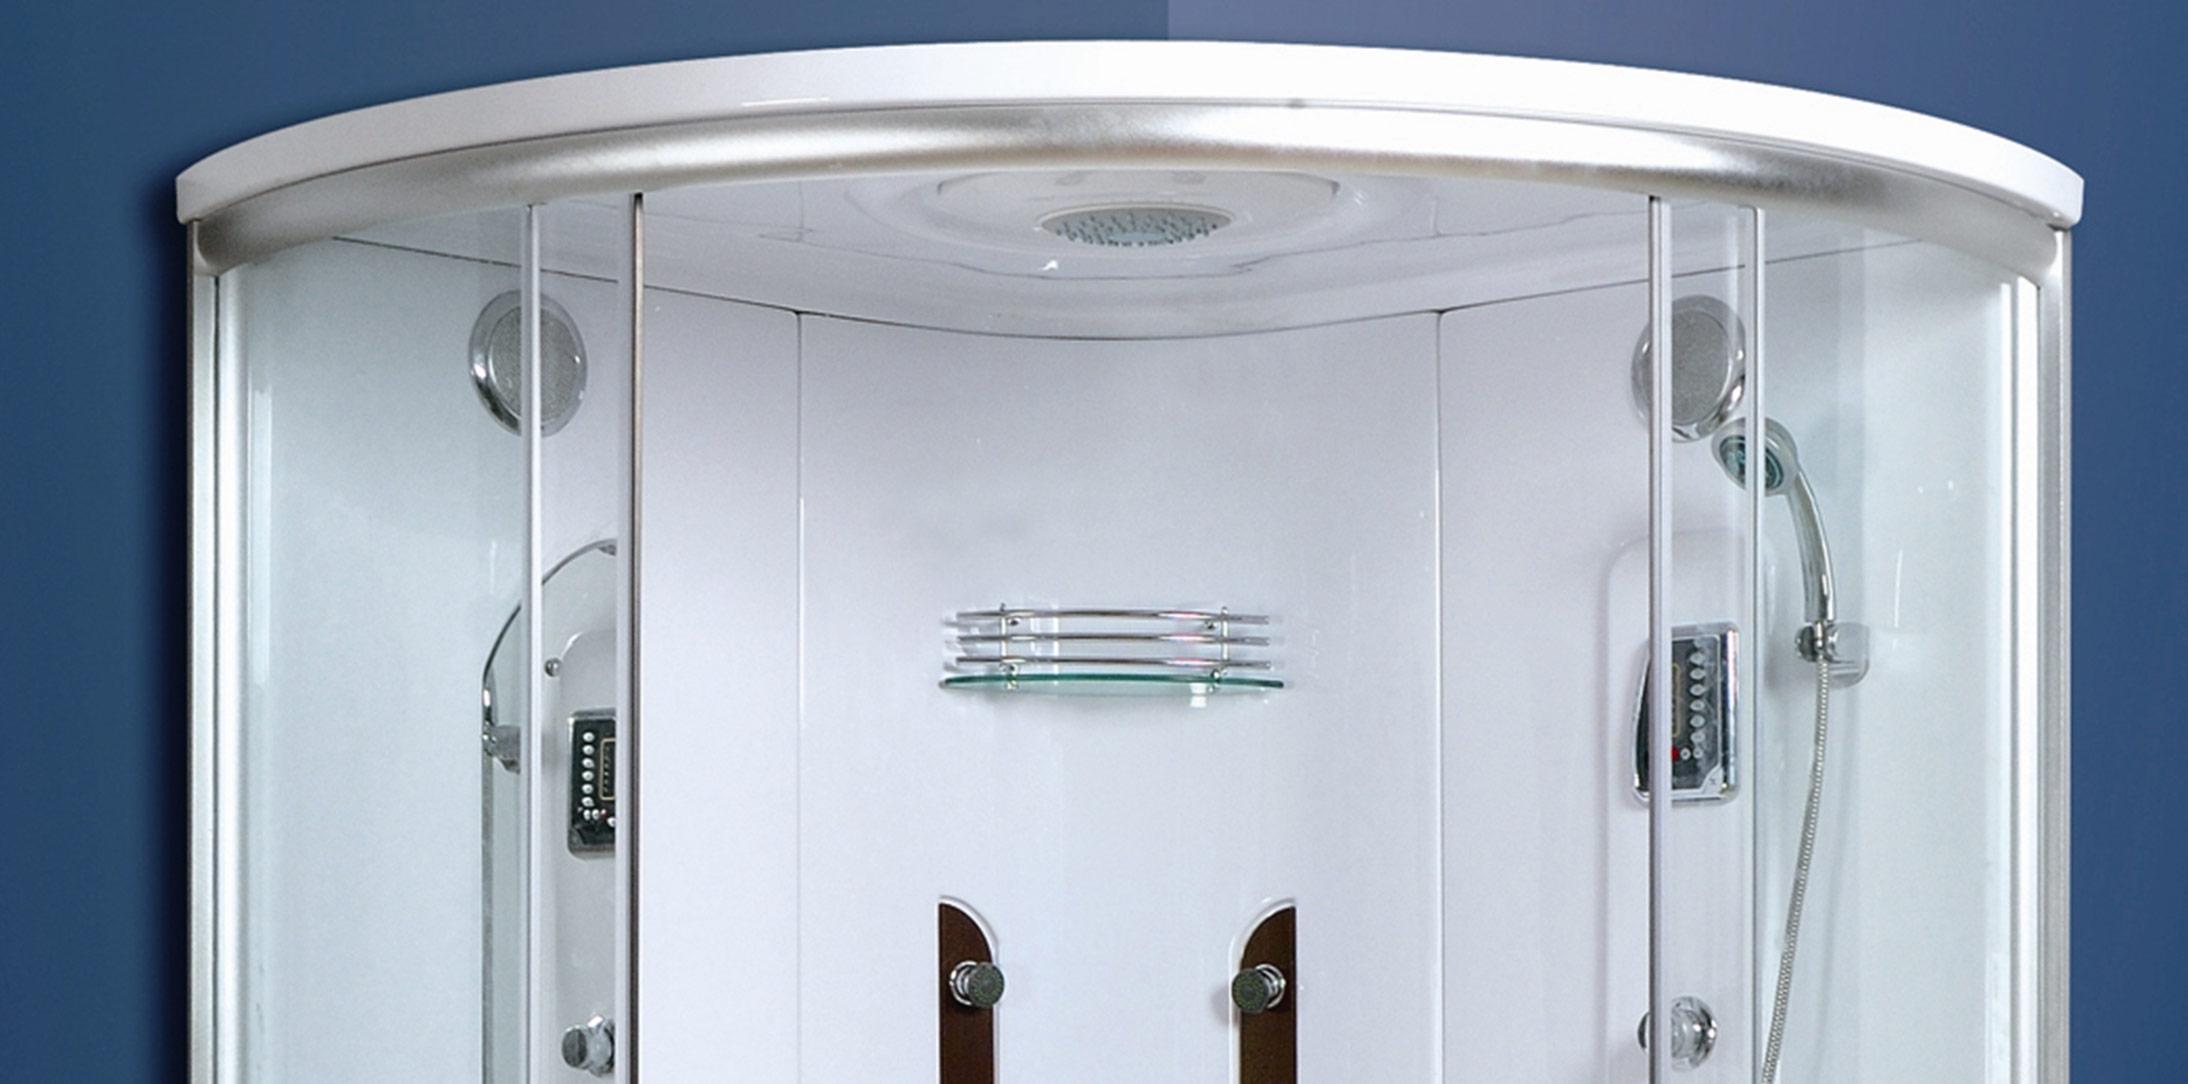 Hydro Showers - Luxury Spas, Inc.